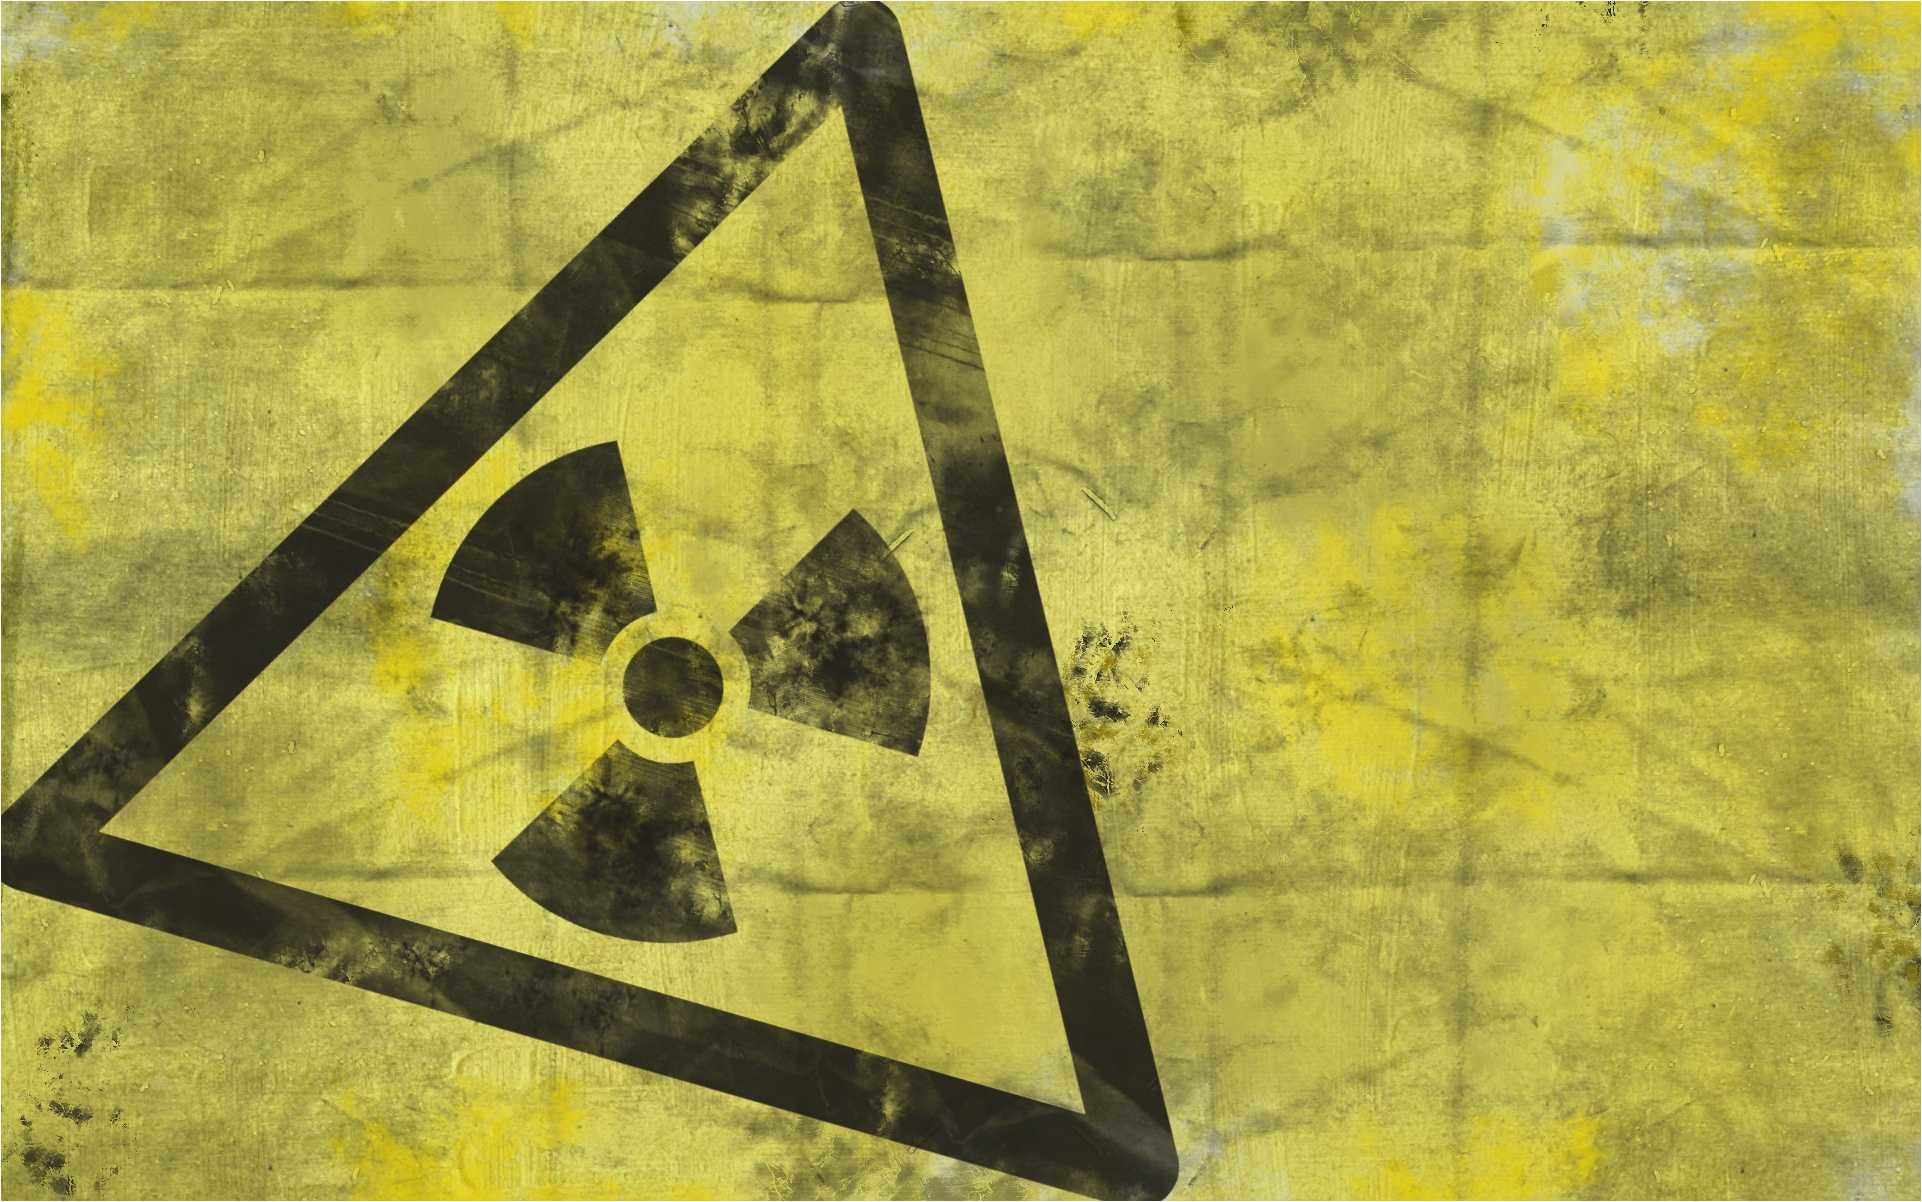 Res: 1922x1202, 24/05/2015: Radioactive Wallpapers, 1920x1200